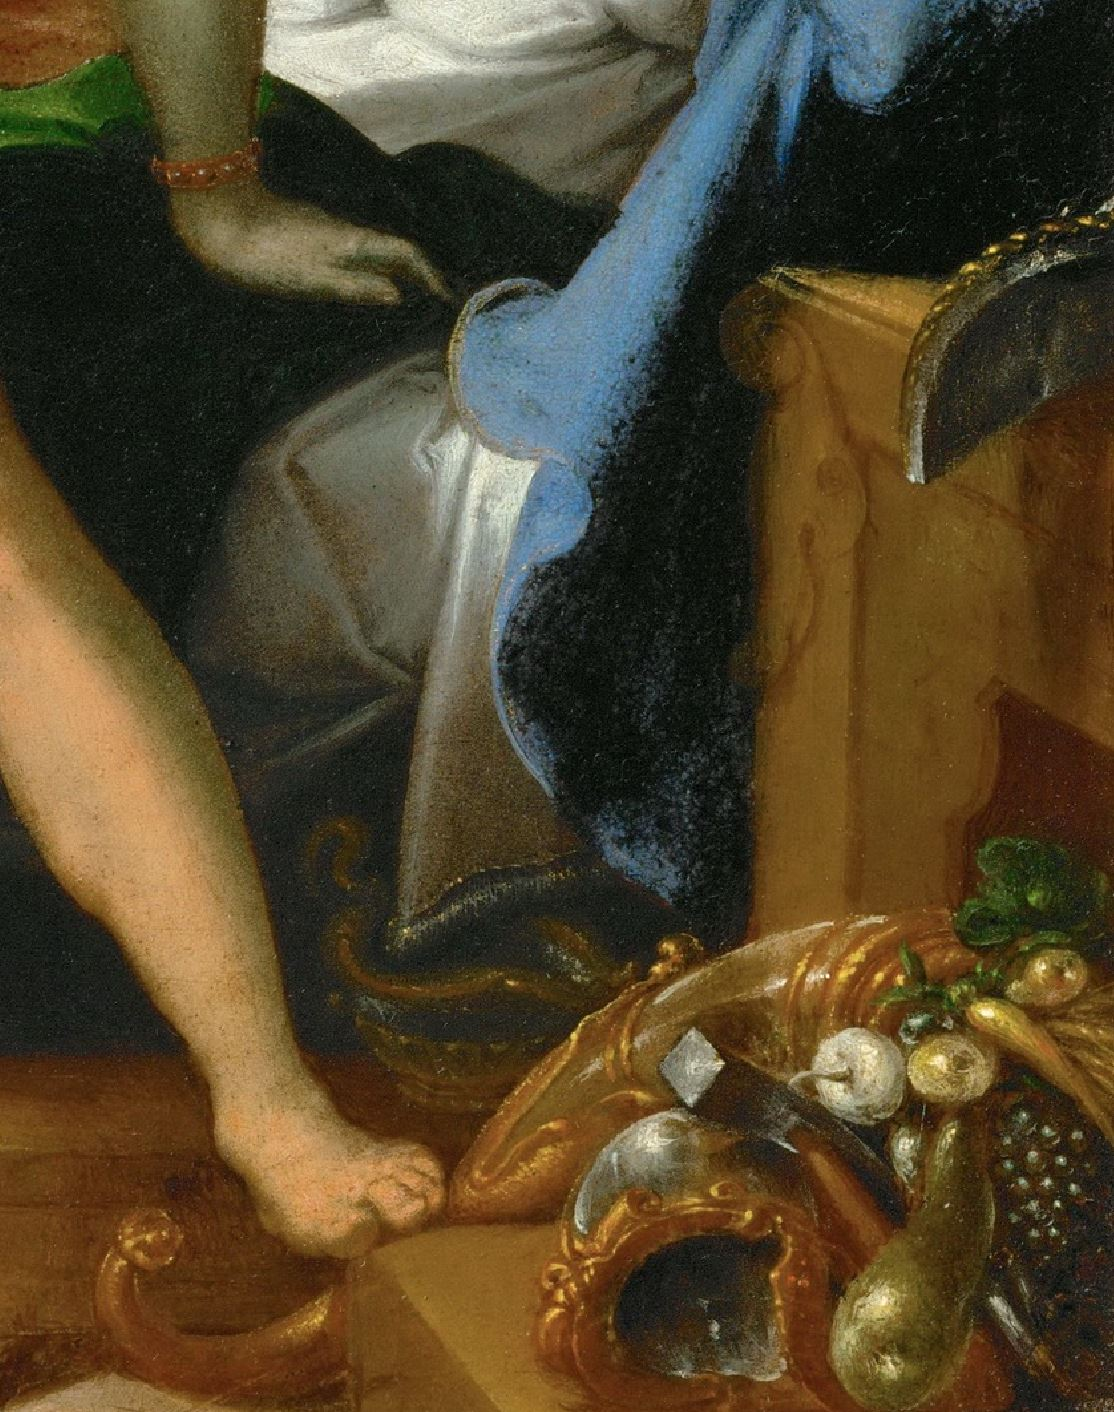 Spranger 1585 ca Vulcain et Maia Kusthistorisches Museum Wien detail objets